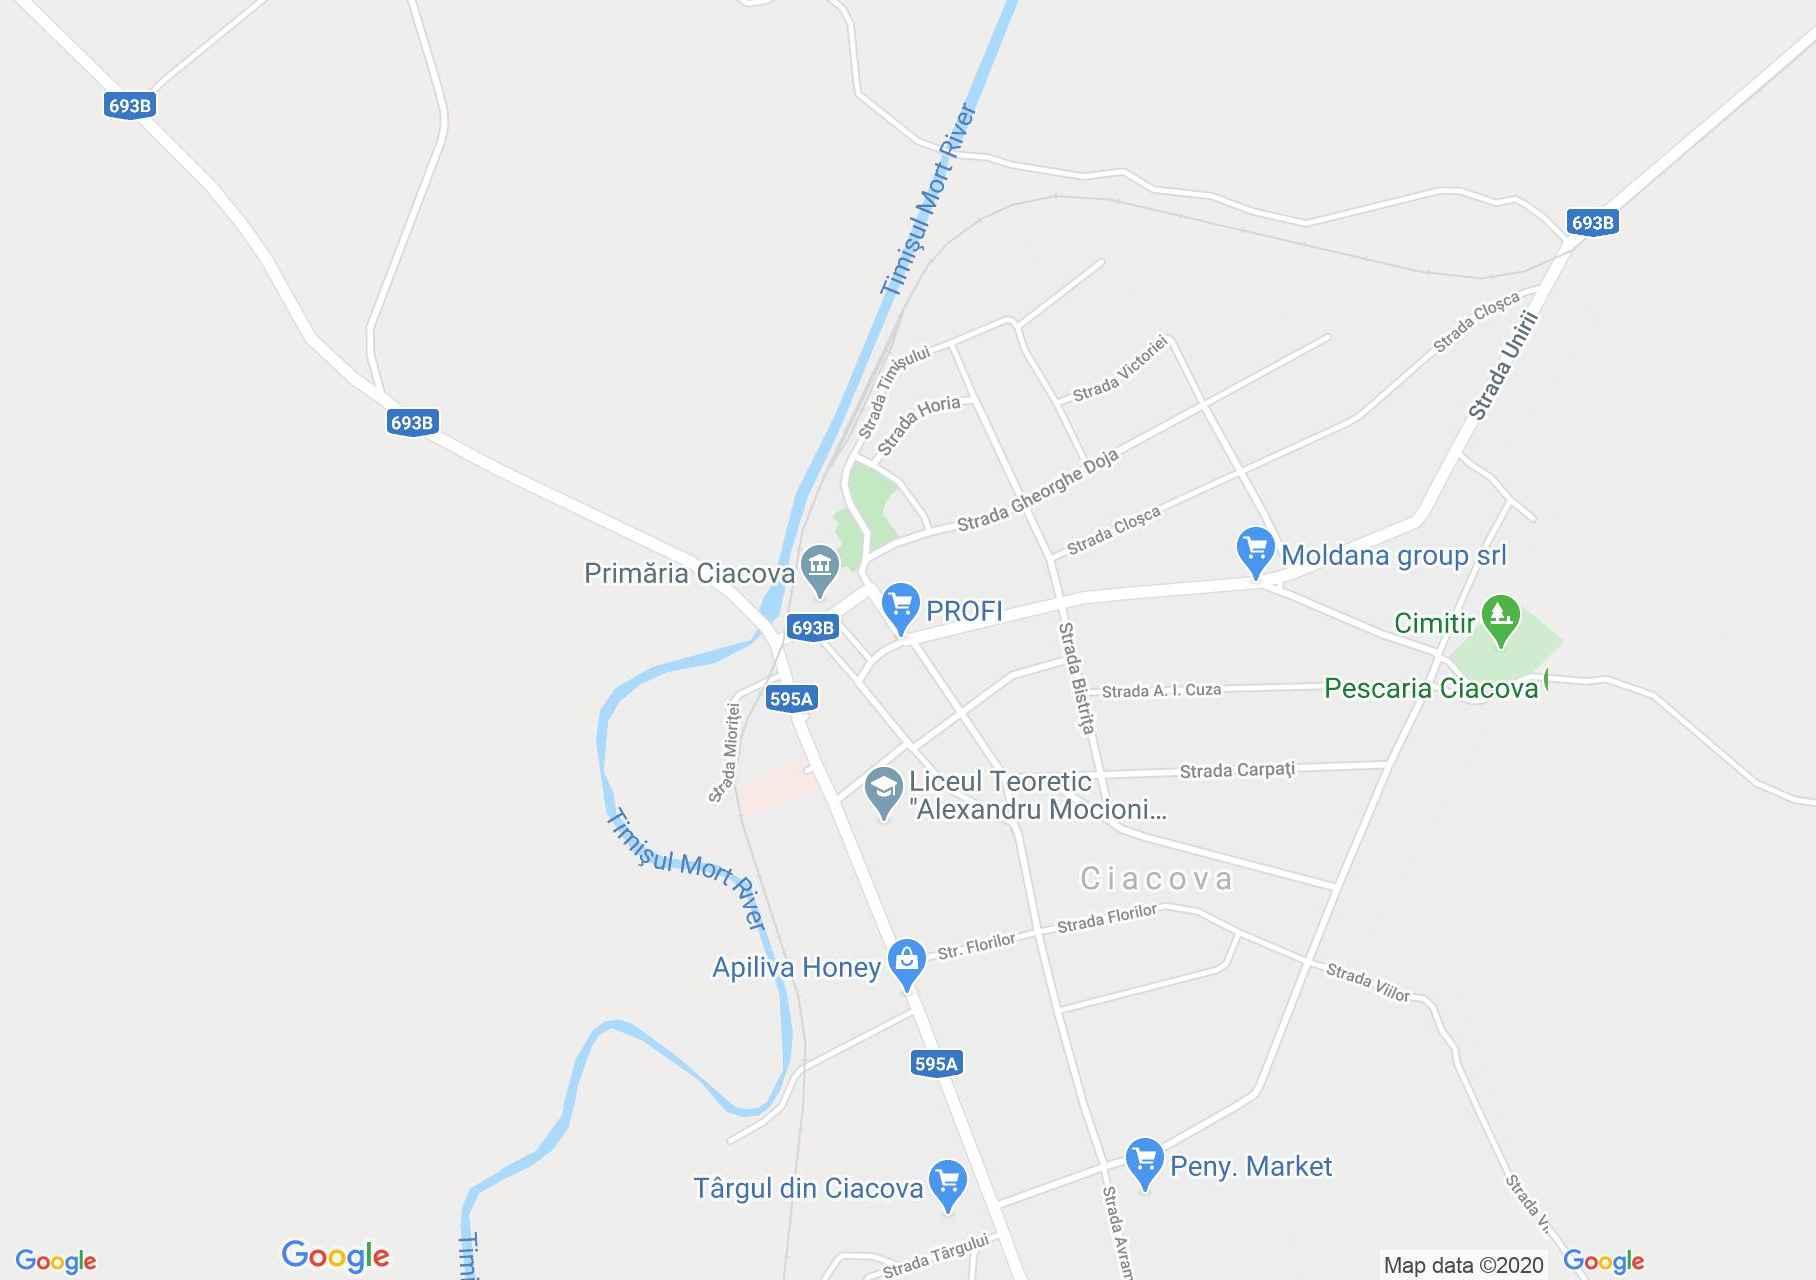 Ciacova, Interactive tourist map